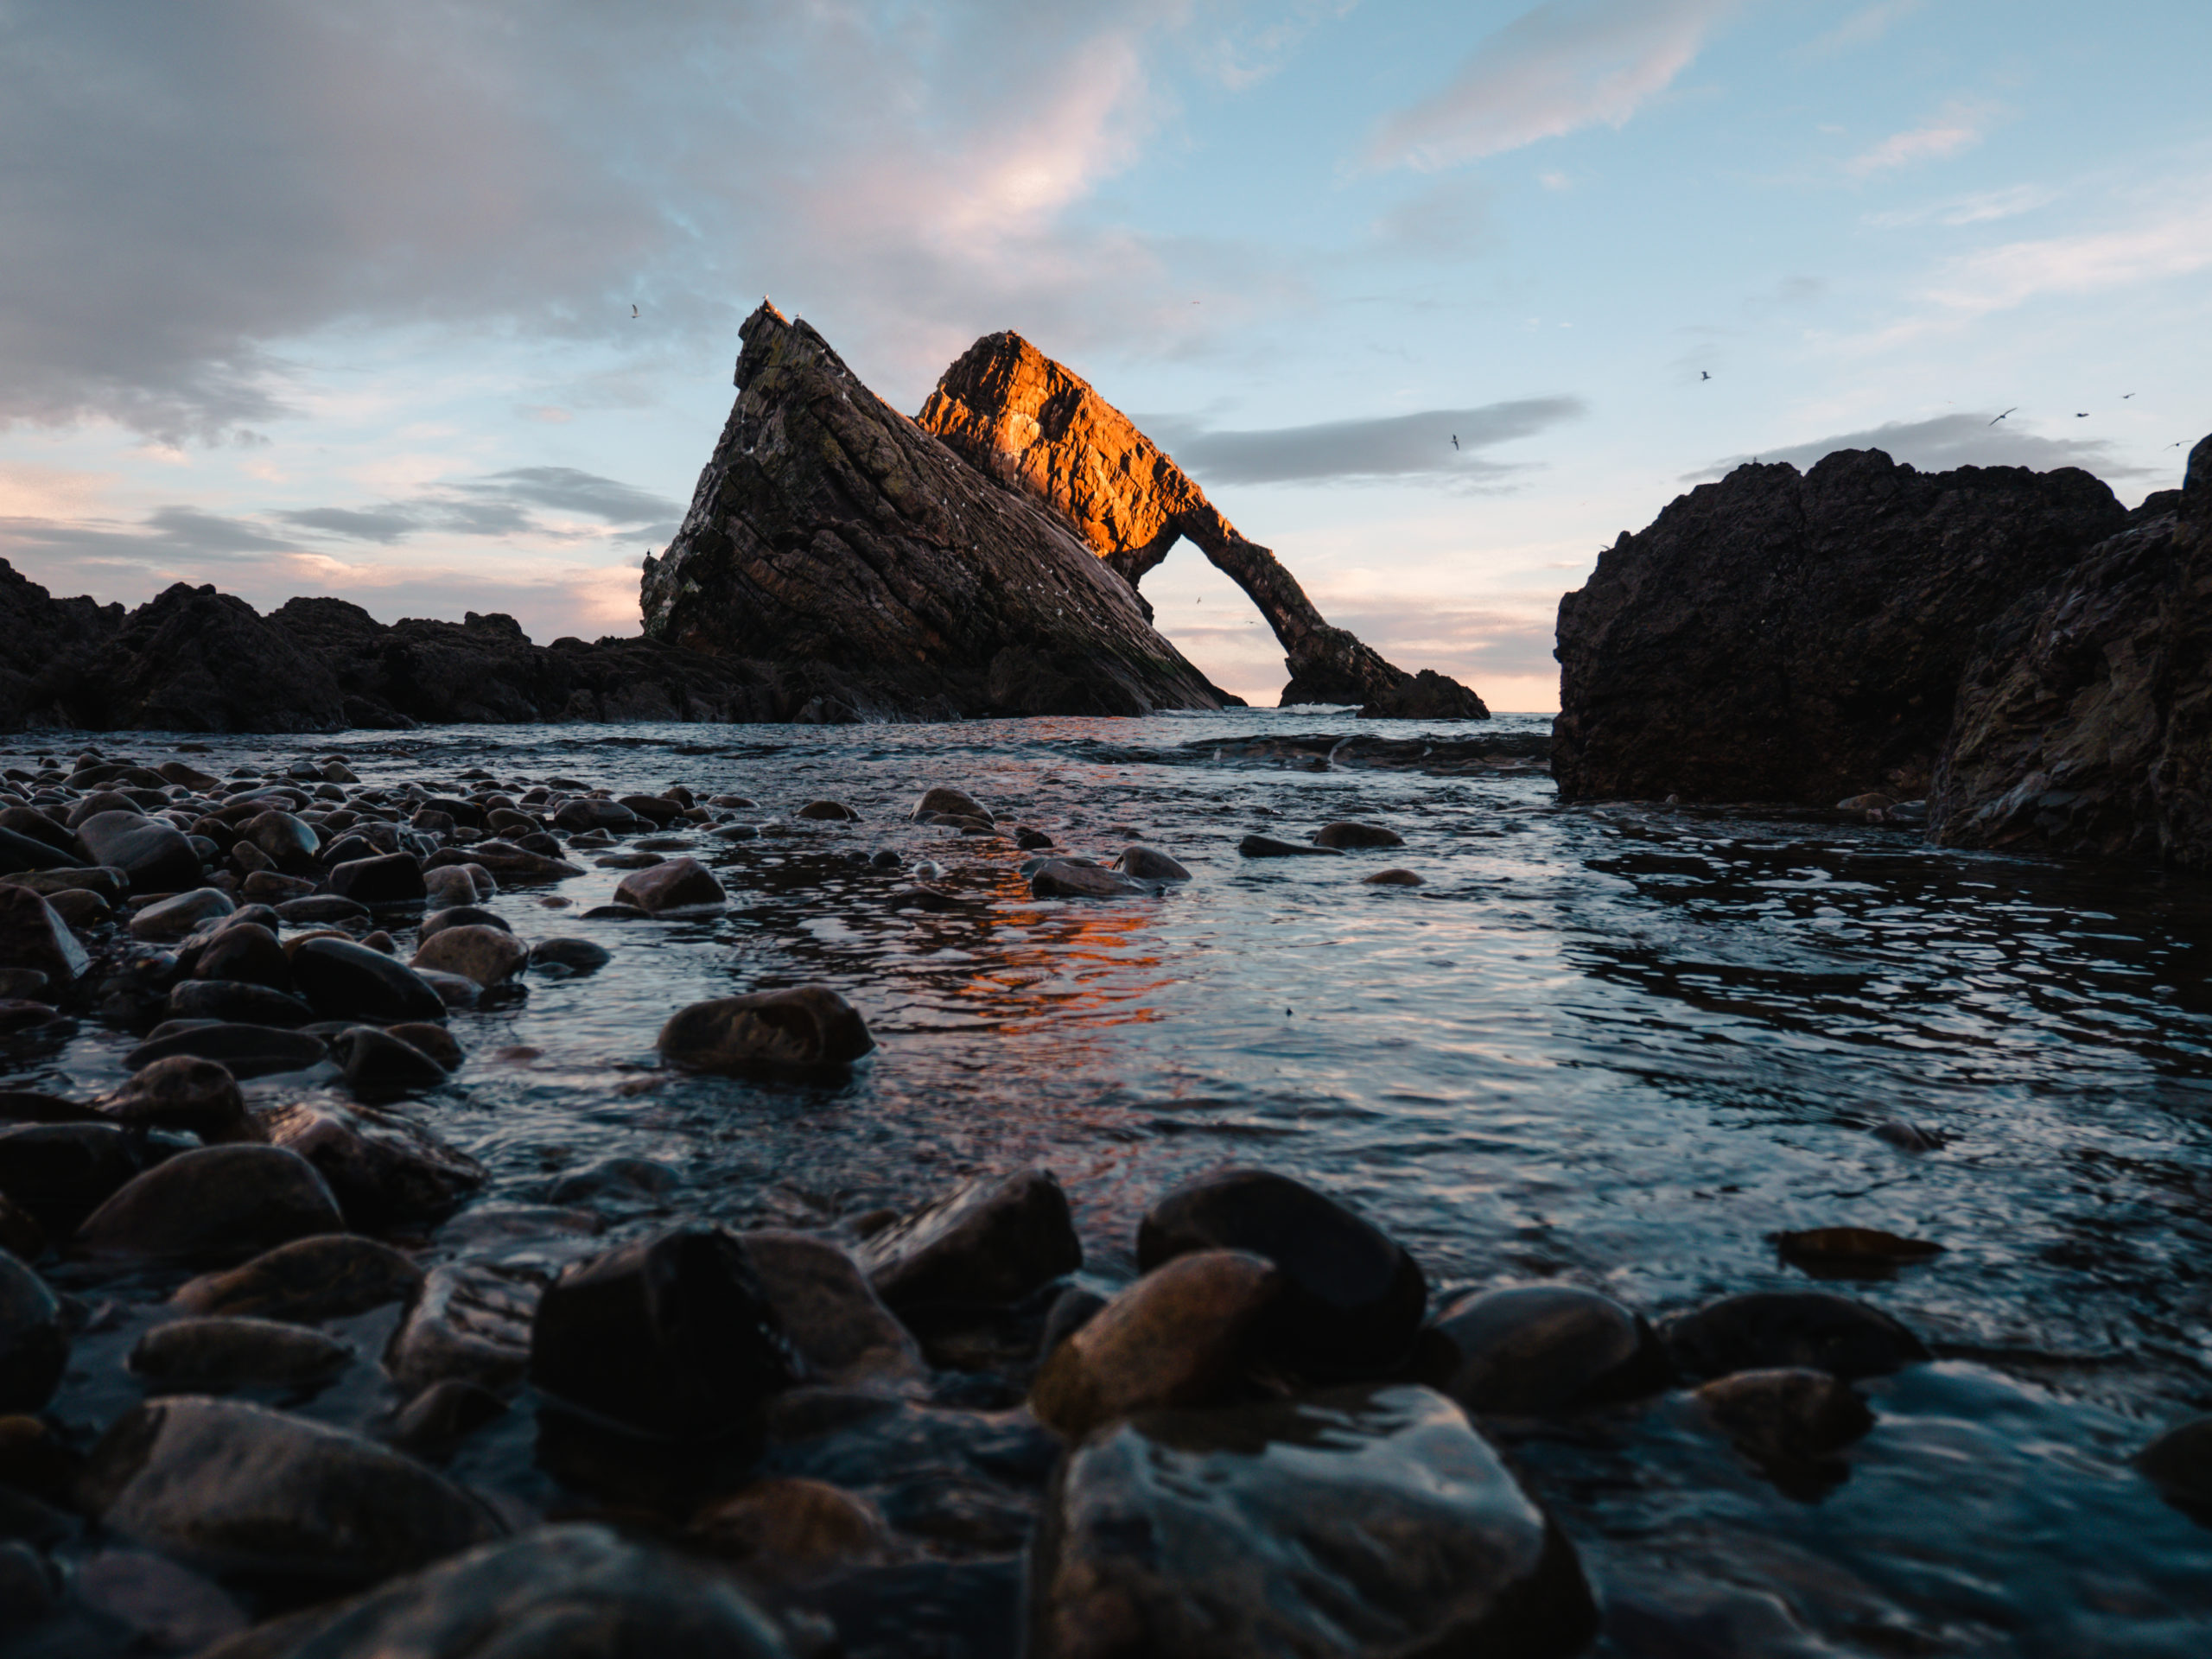 bow fiddle rock écosse mer vue ballade highlands